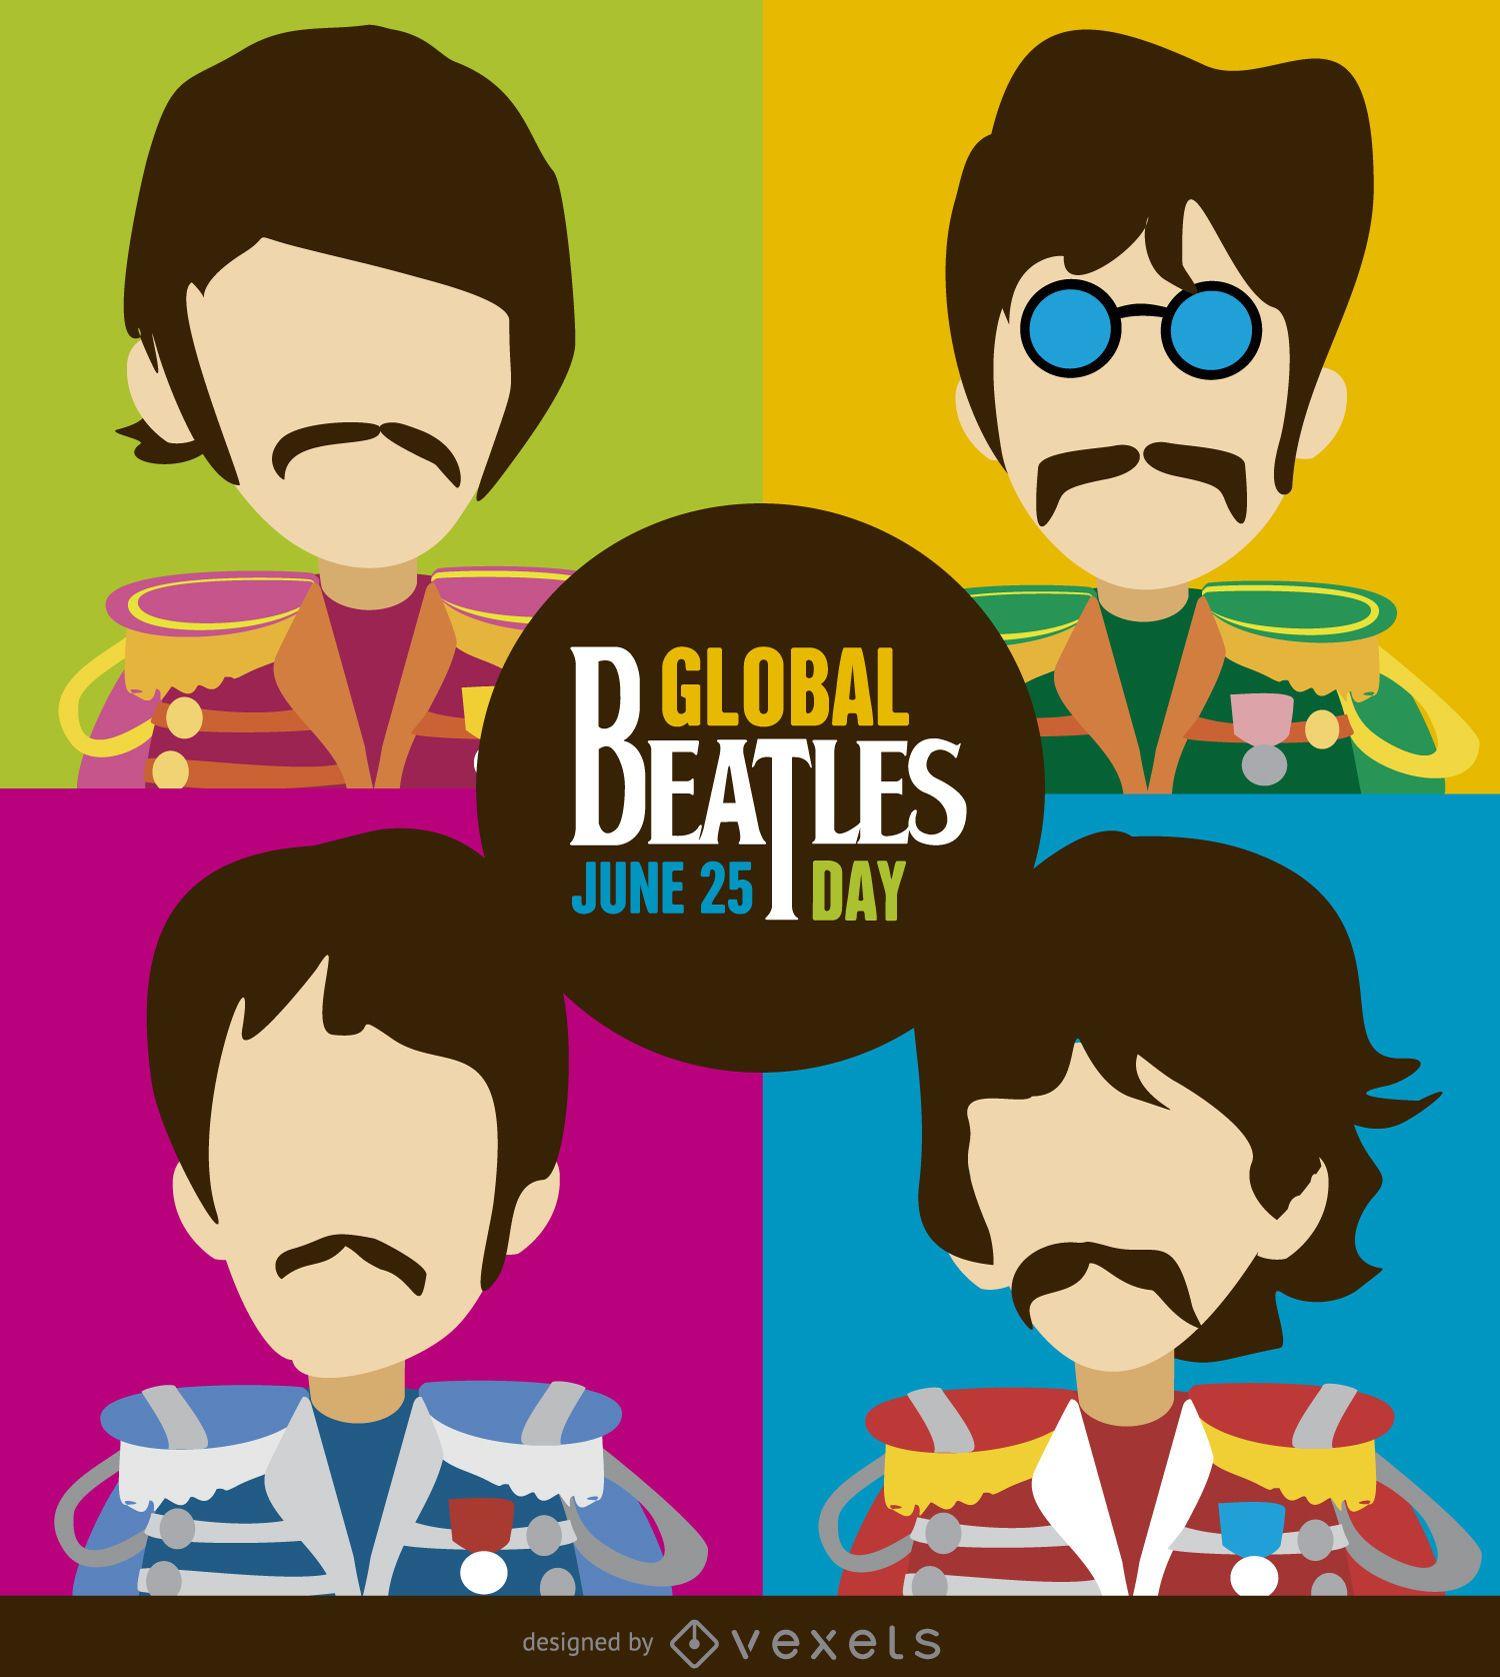 Amazoncom The Compleat Beatles VHS John Lennon Paul